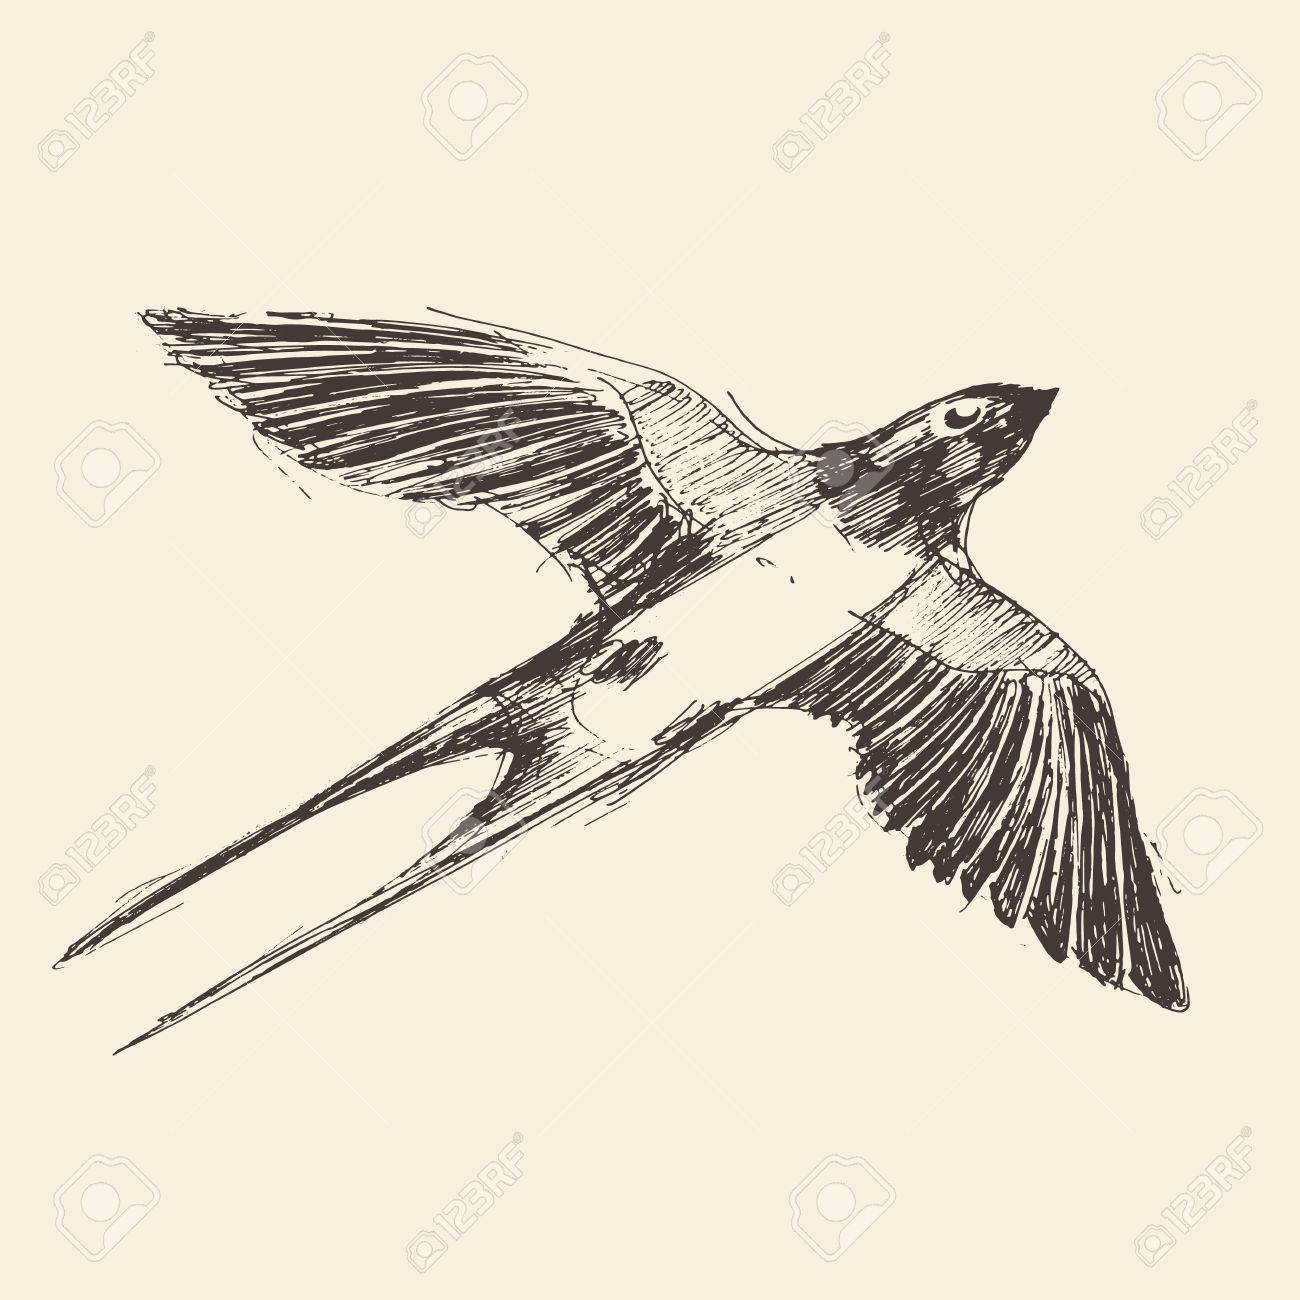 1300x1300 Swallow Bird Hand Drawn Vintage Engraved Illustration, Sketch